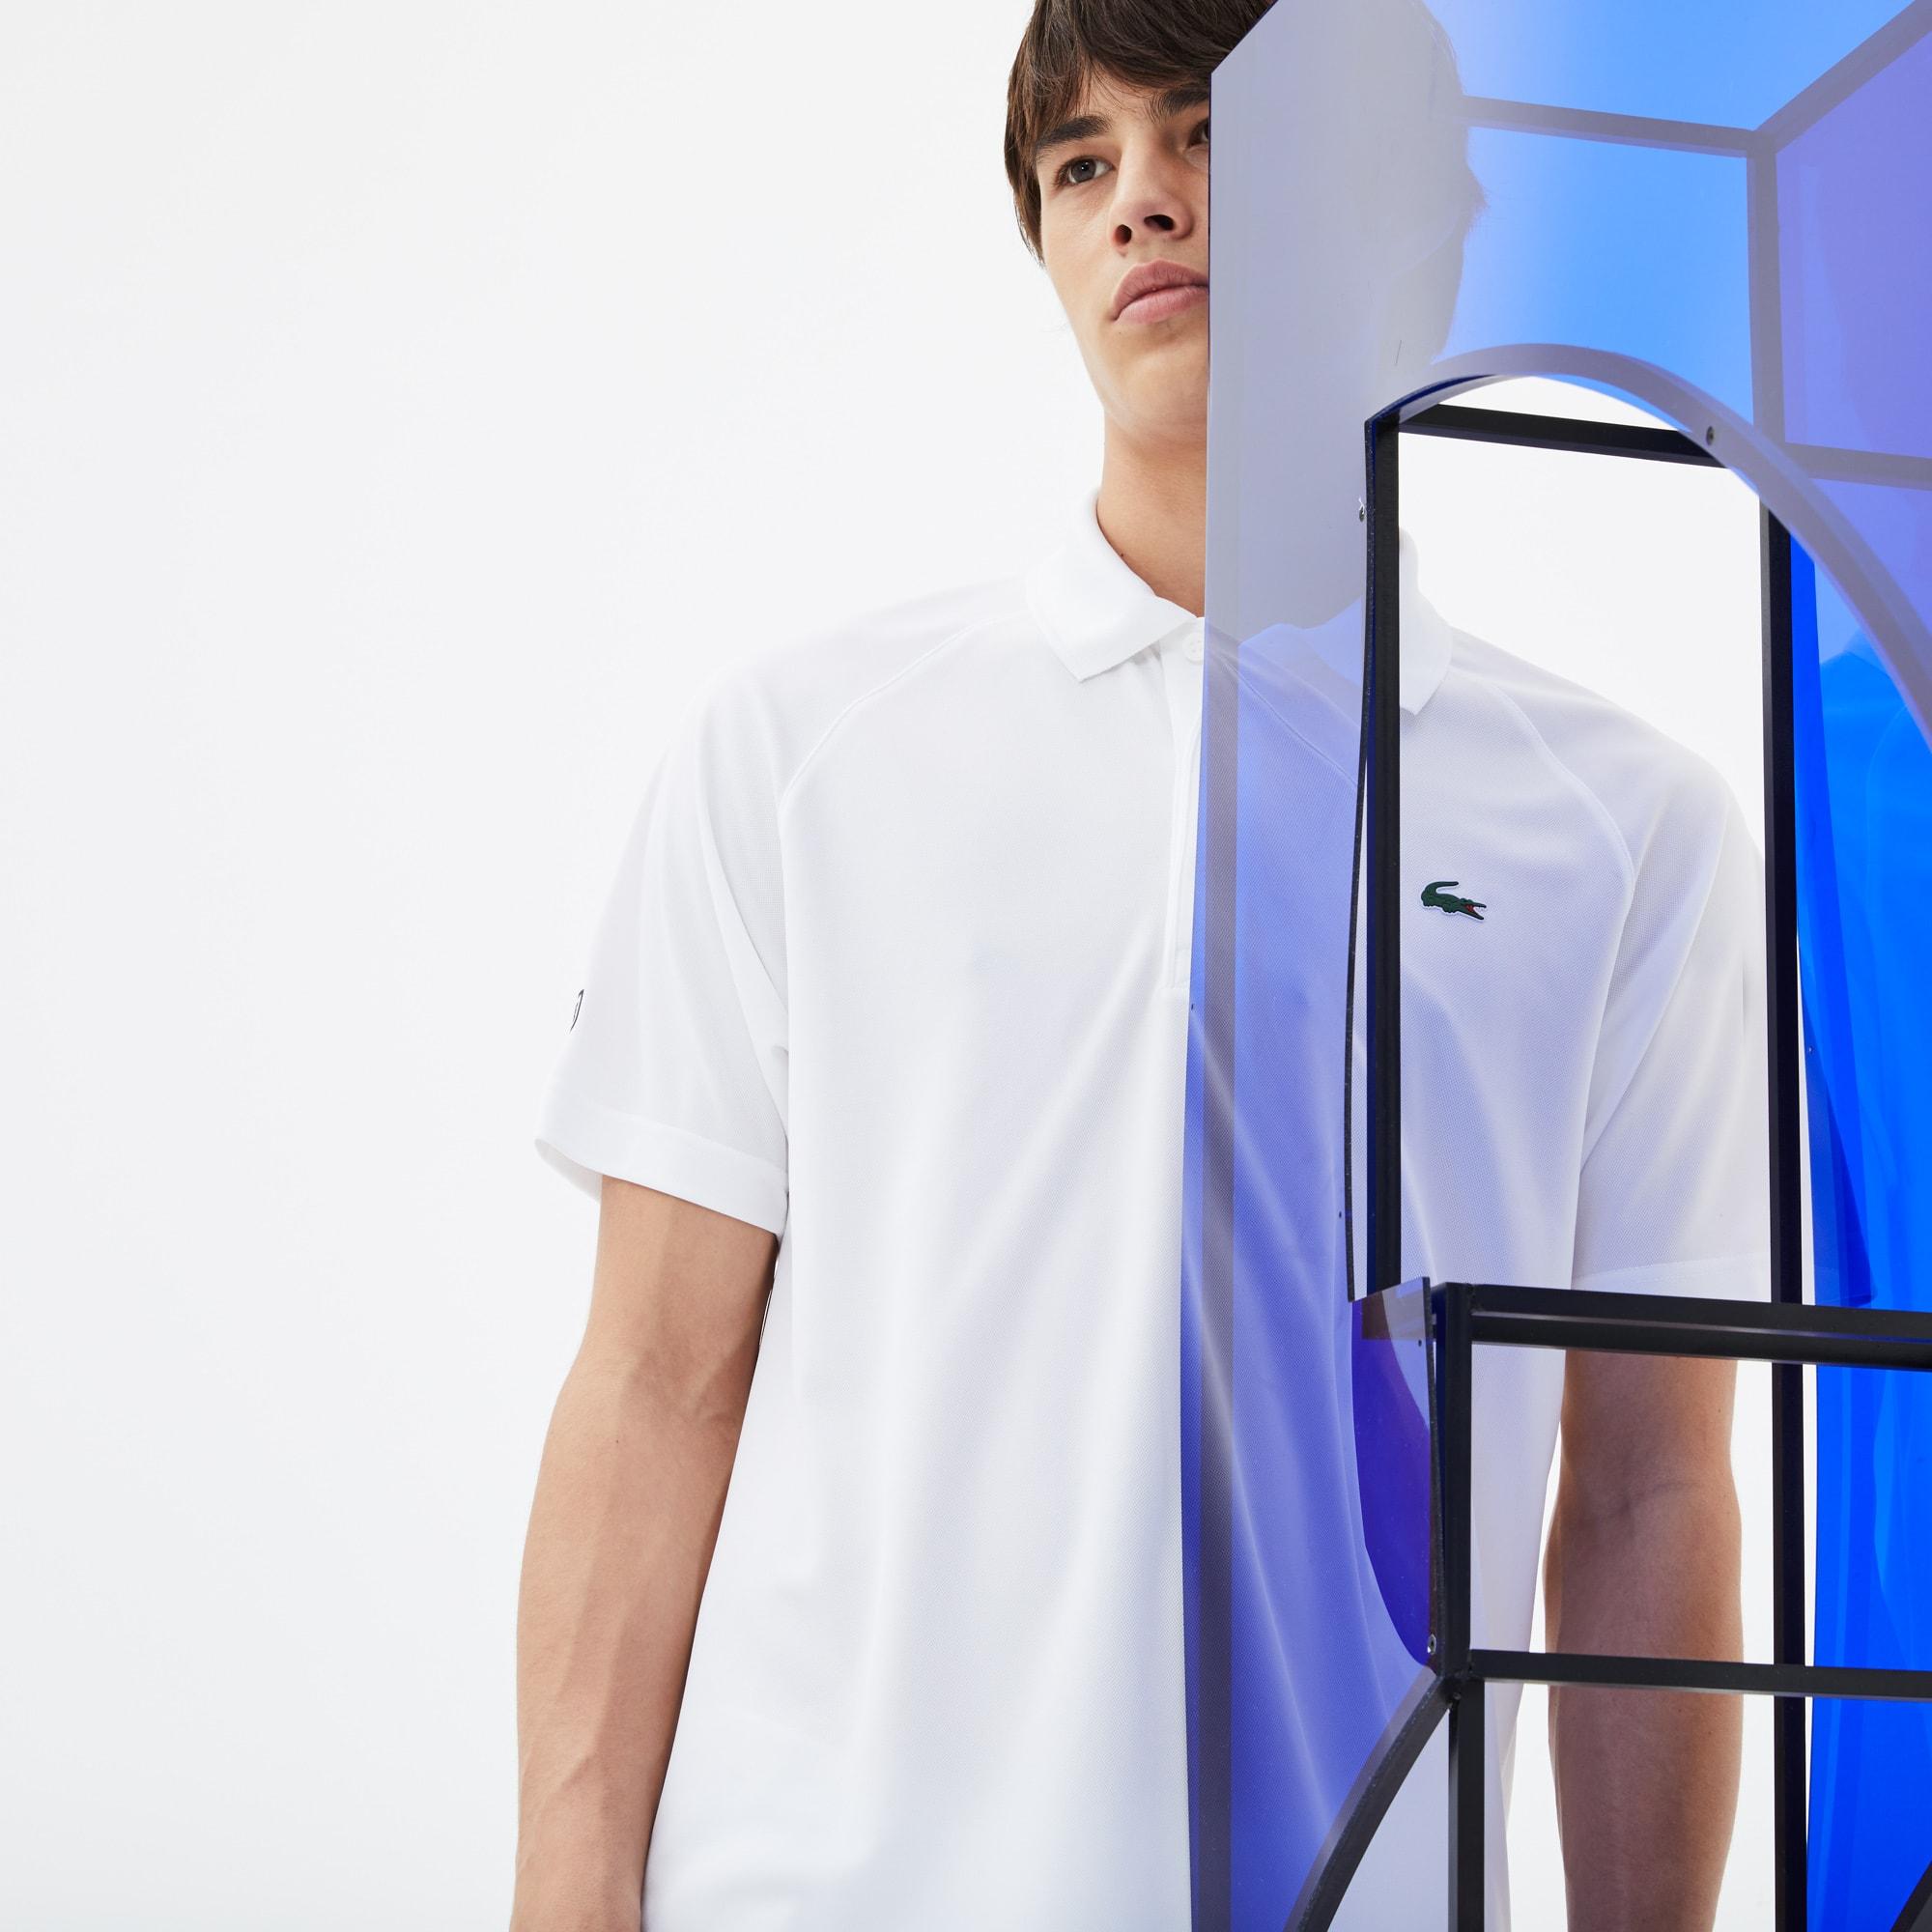 Polo Shirt Lacoste Collection for Novak Djokovic - Exclusive Green Edition